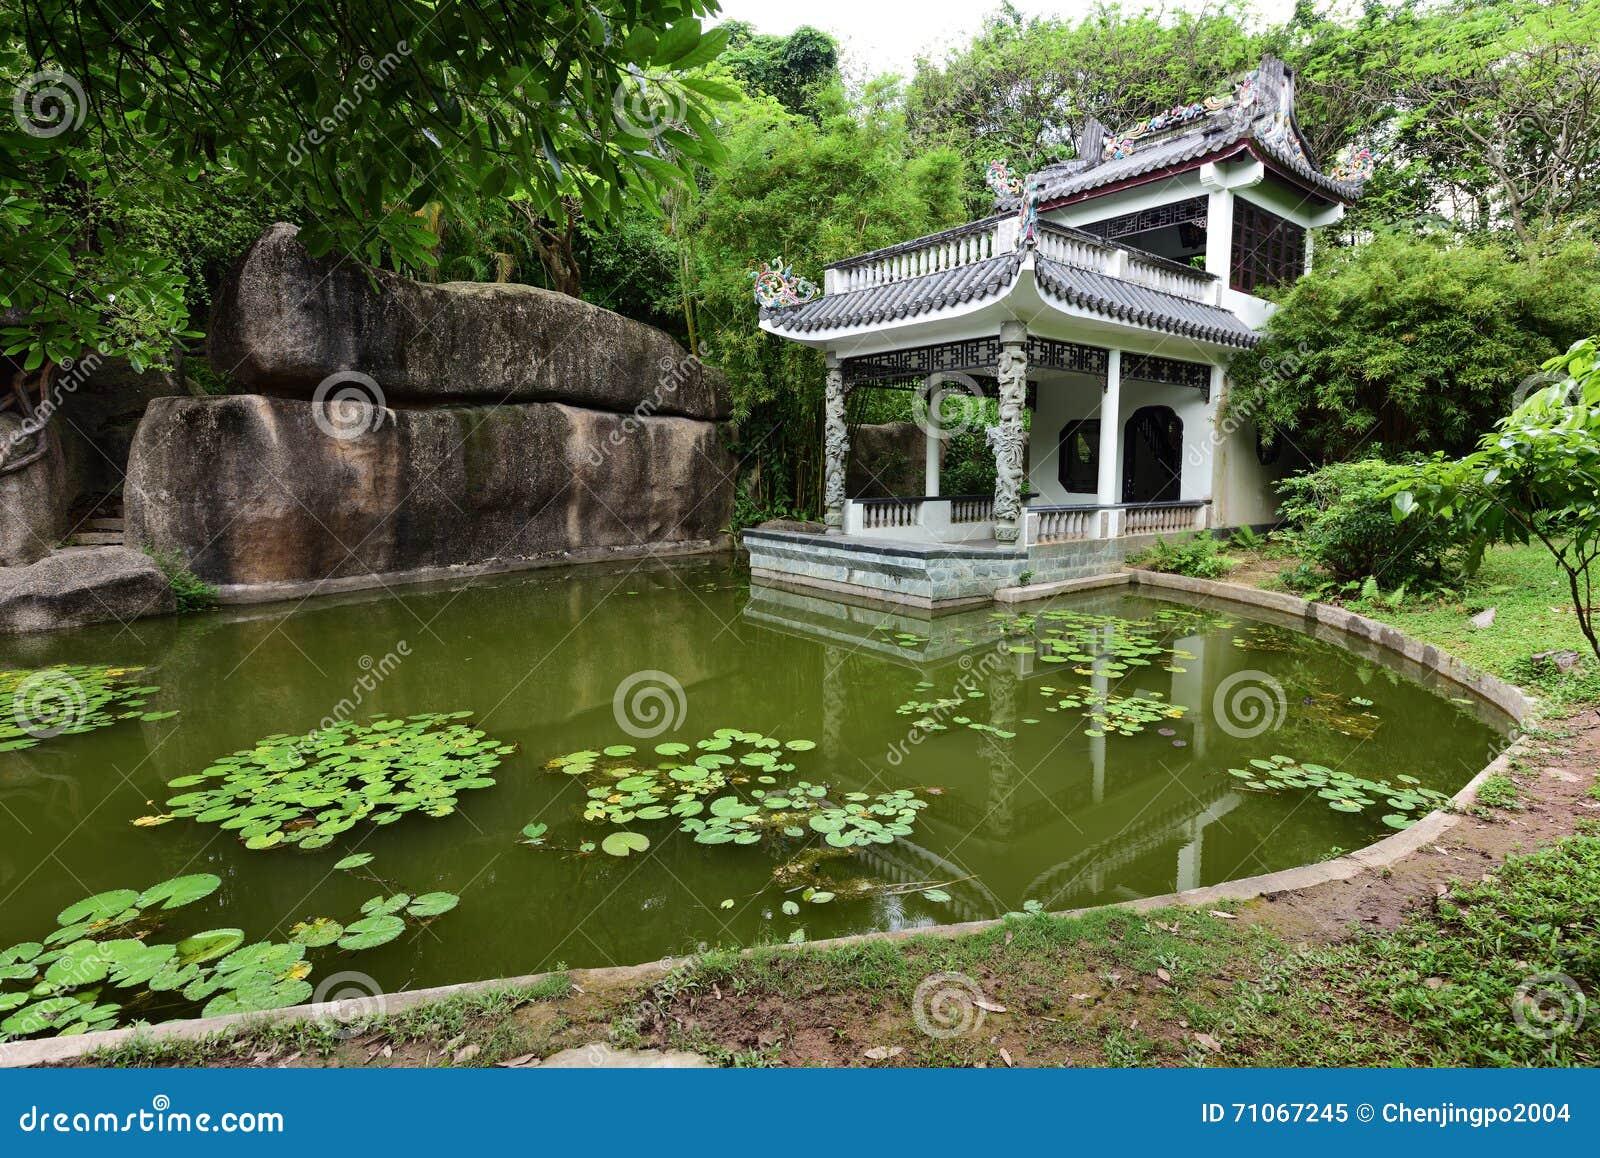 Giardino antico cinese immagine stock immagine di famoso for Giardino cinese